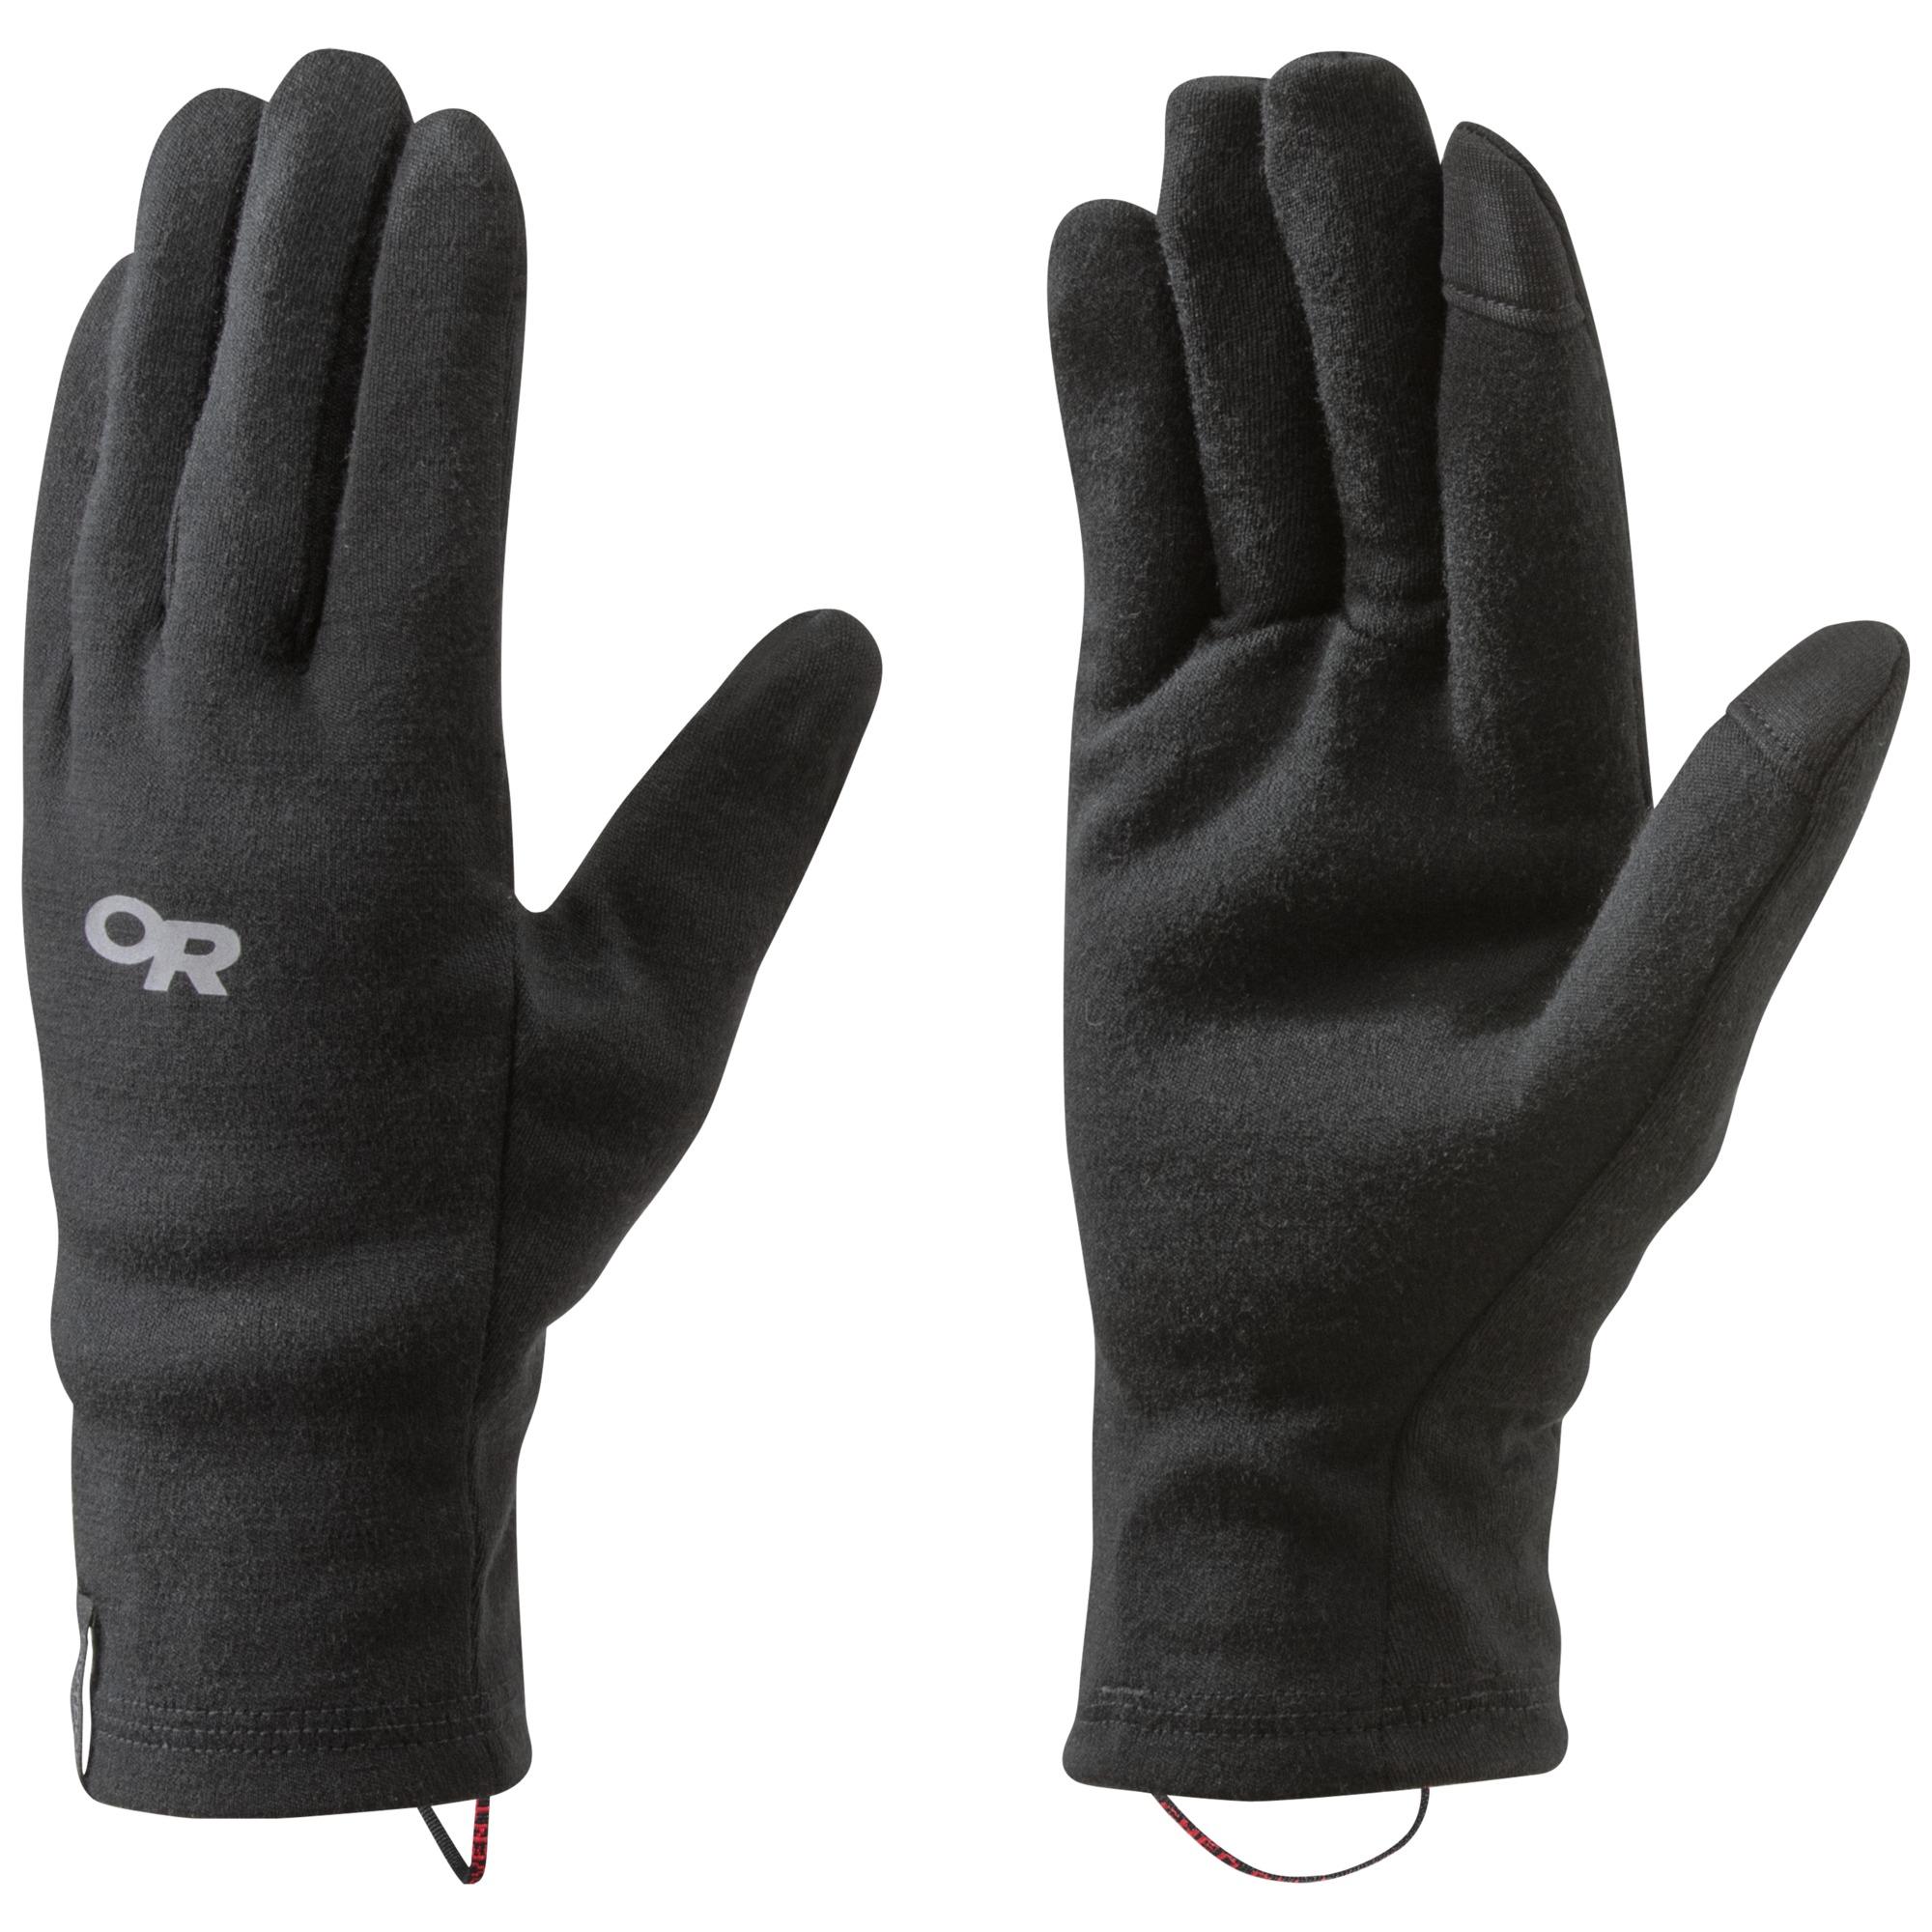 【Outdoor Research】美麗諾羊毛保暖手套 可觸控 WOOLLY SENSOR LINERS 黑色  #253957 旅形